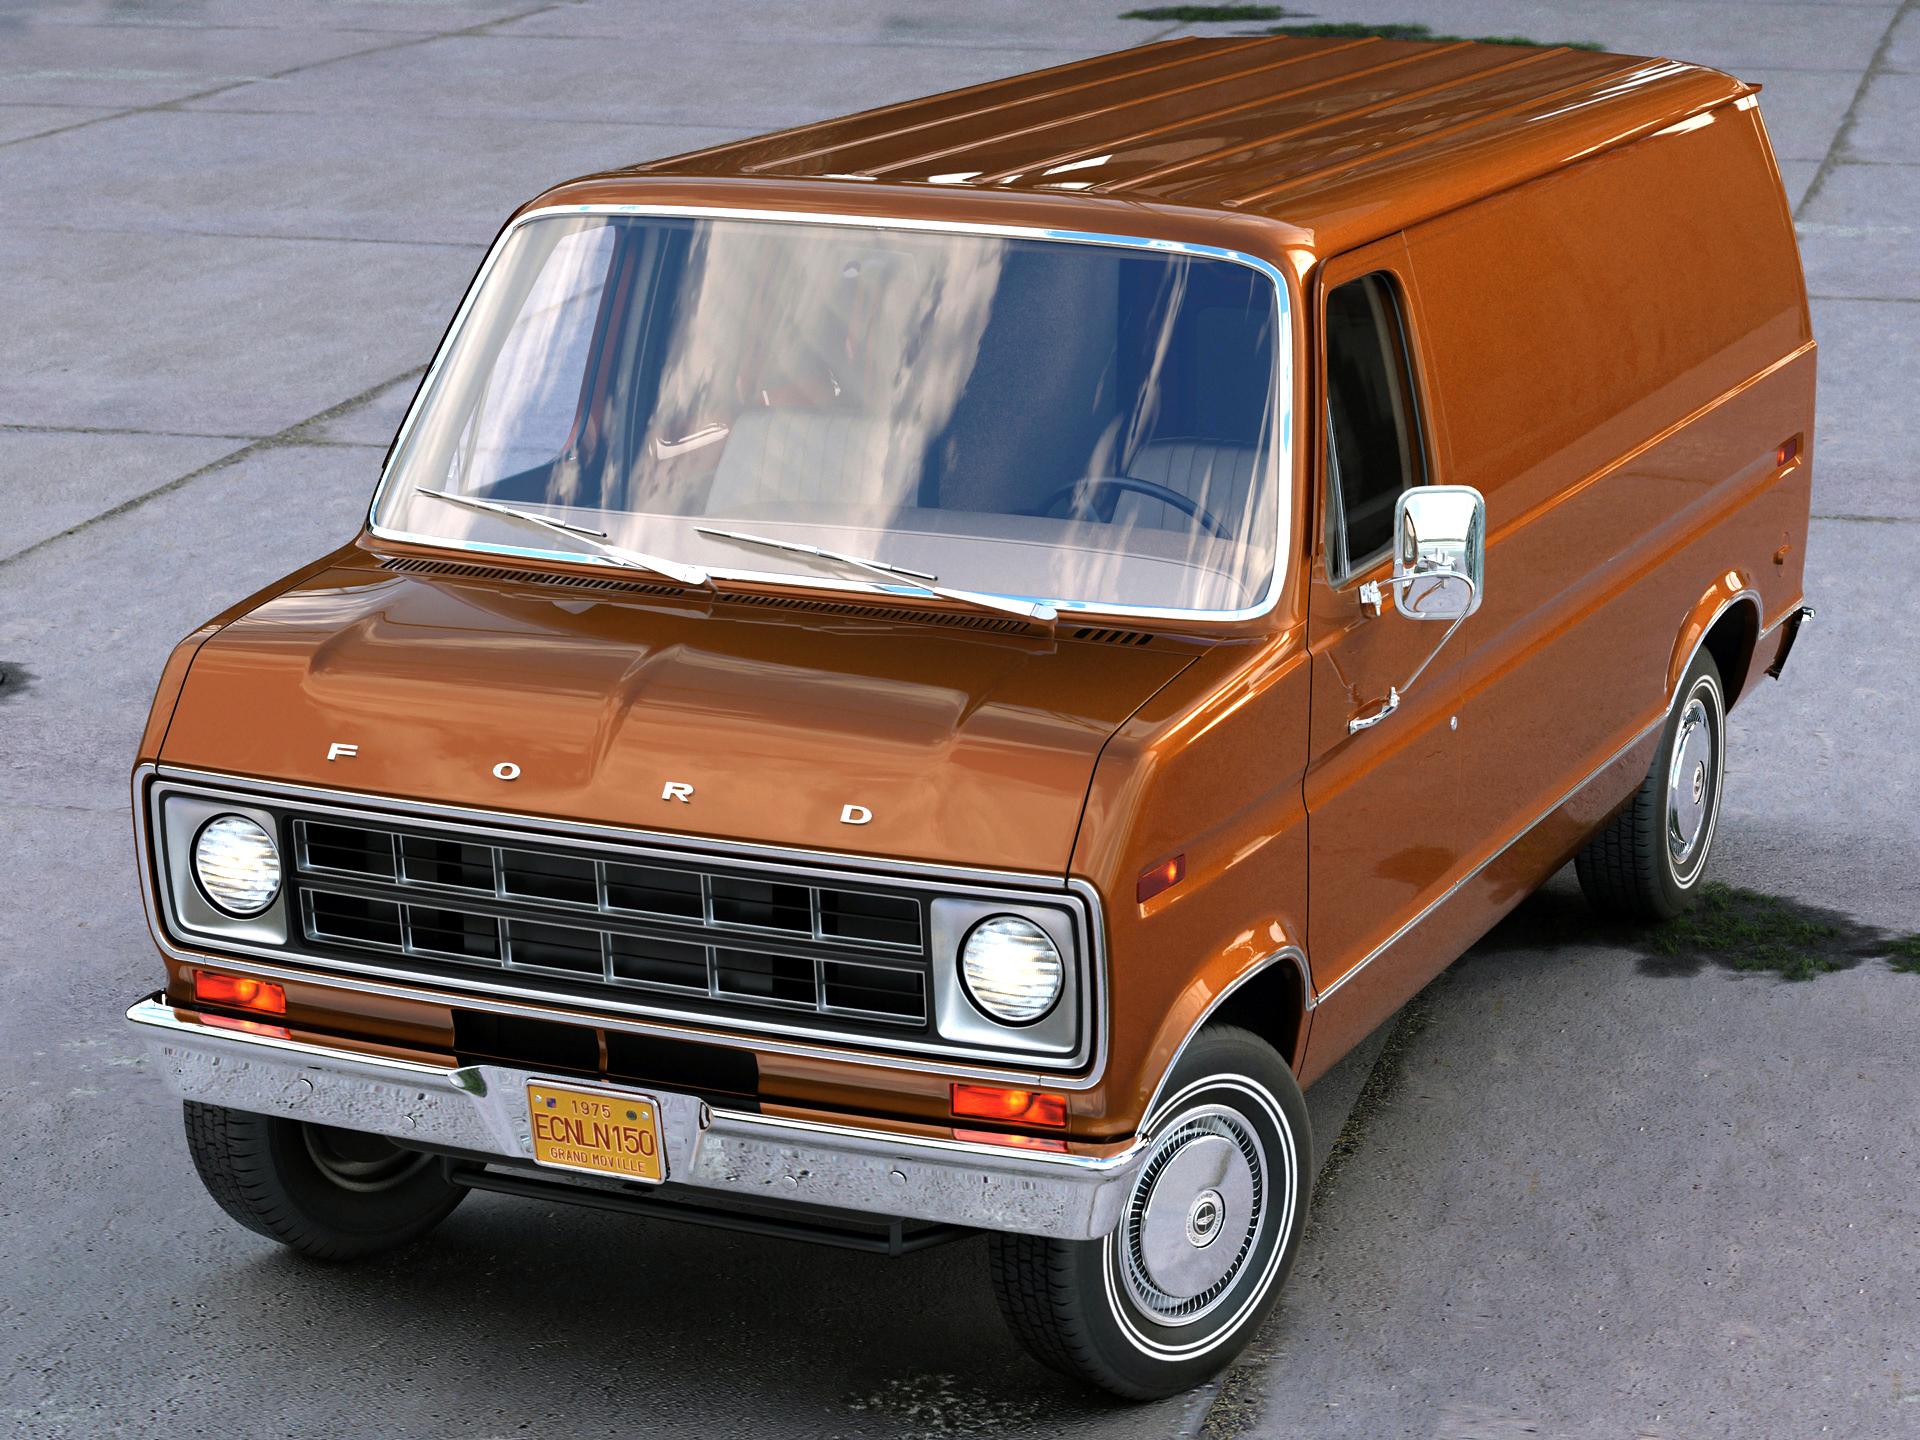 econoline cargo 1975 3d model 3ds max fbx c4d obj 218499